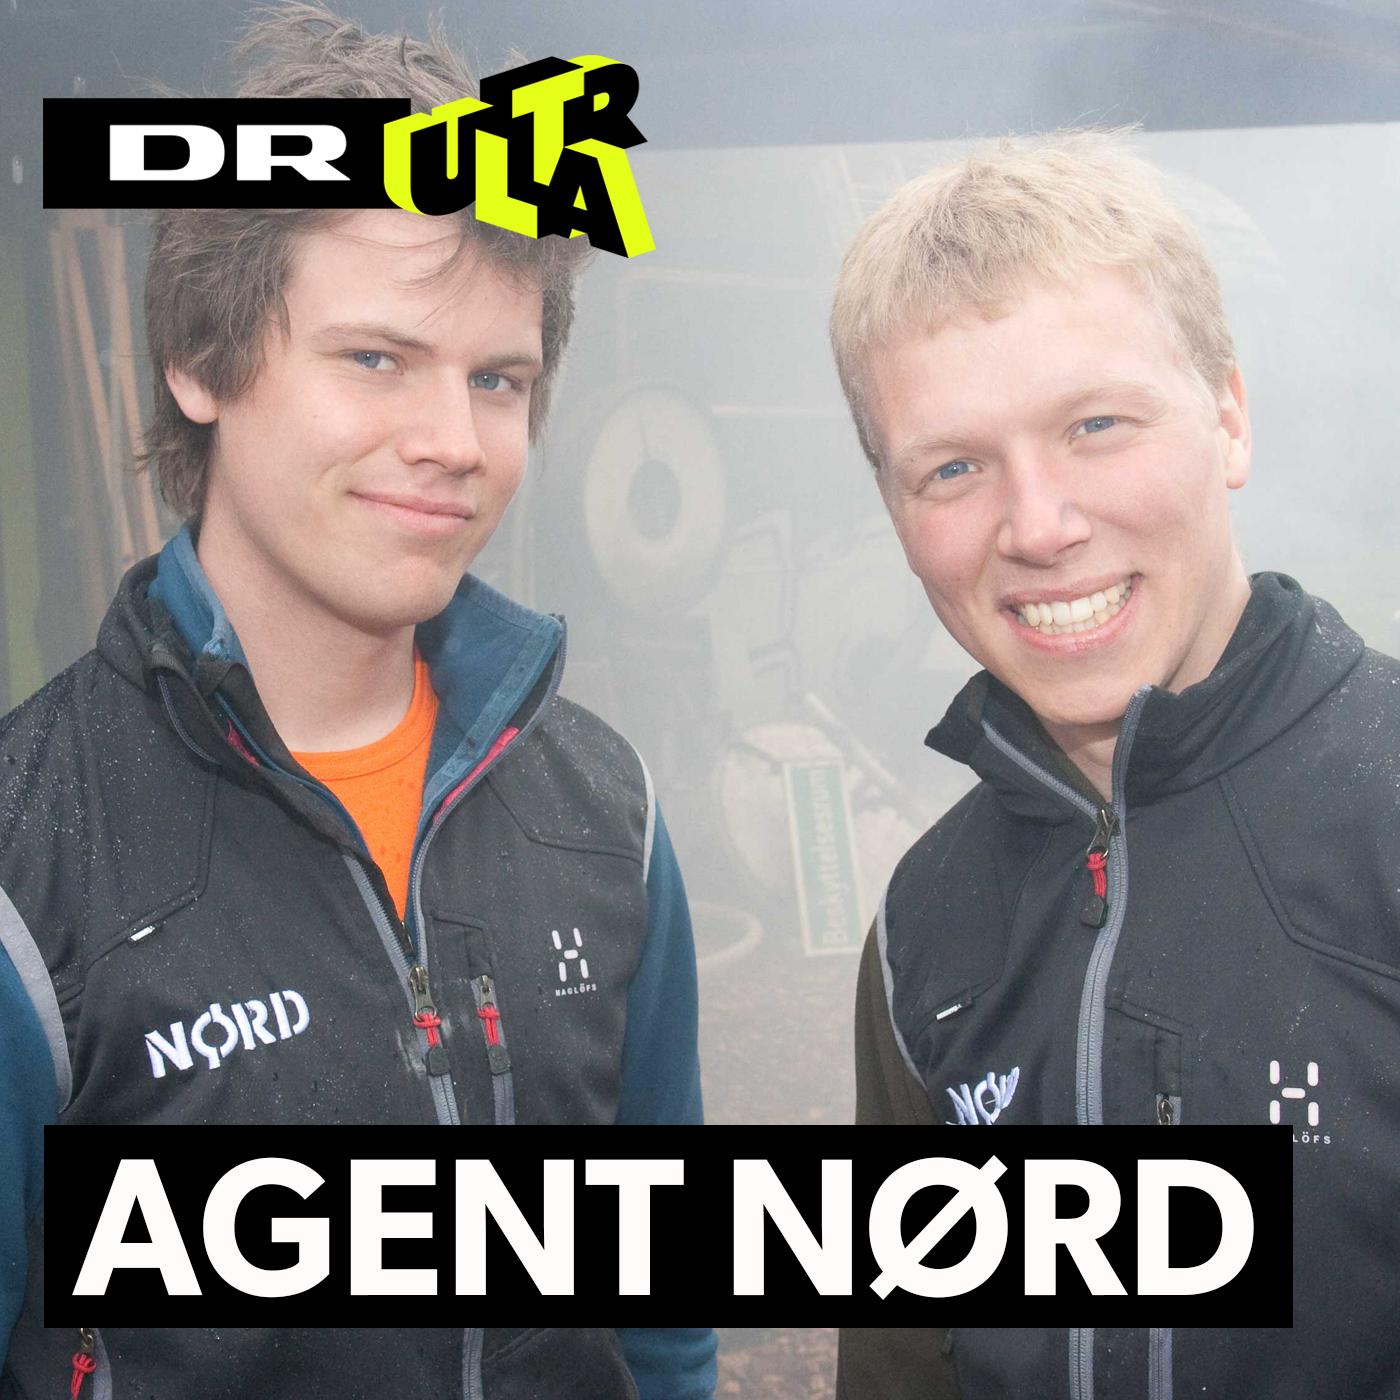 Agent Nørd